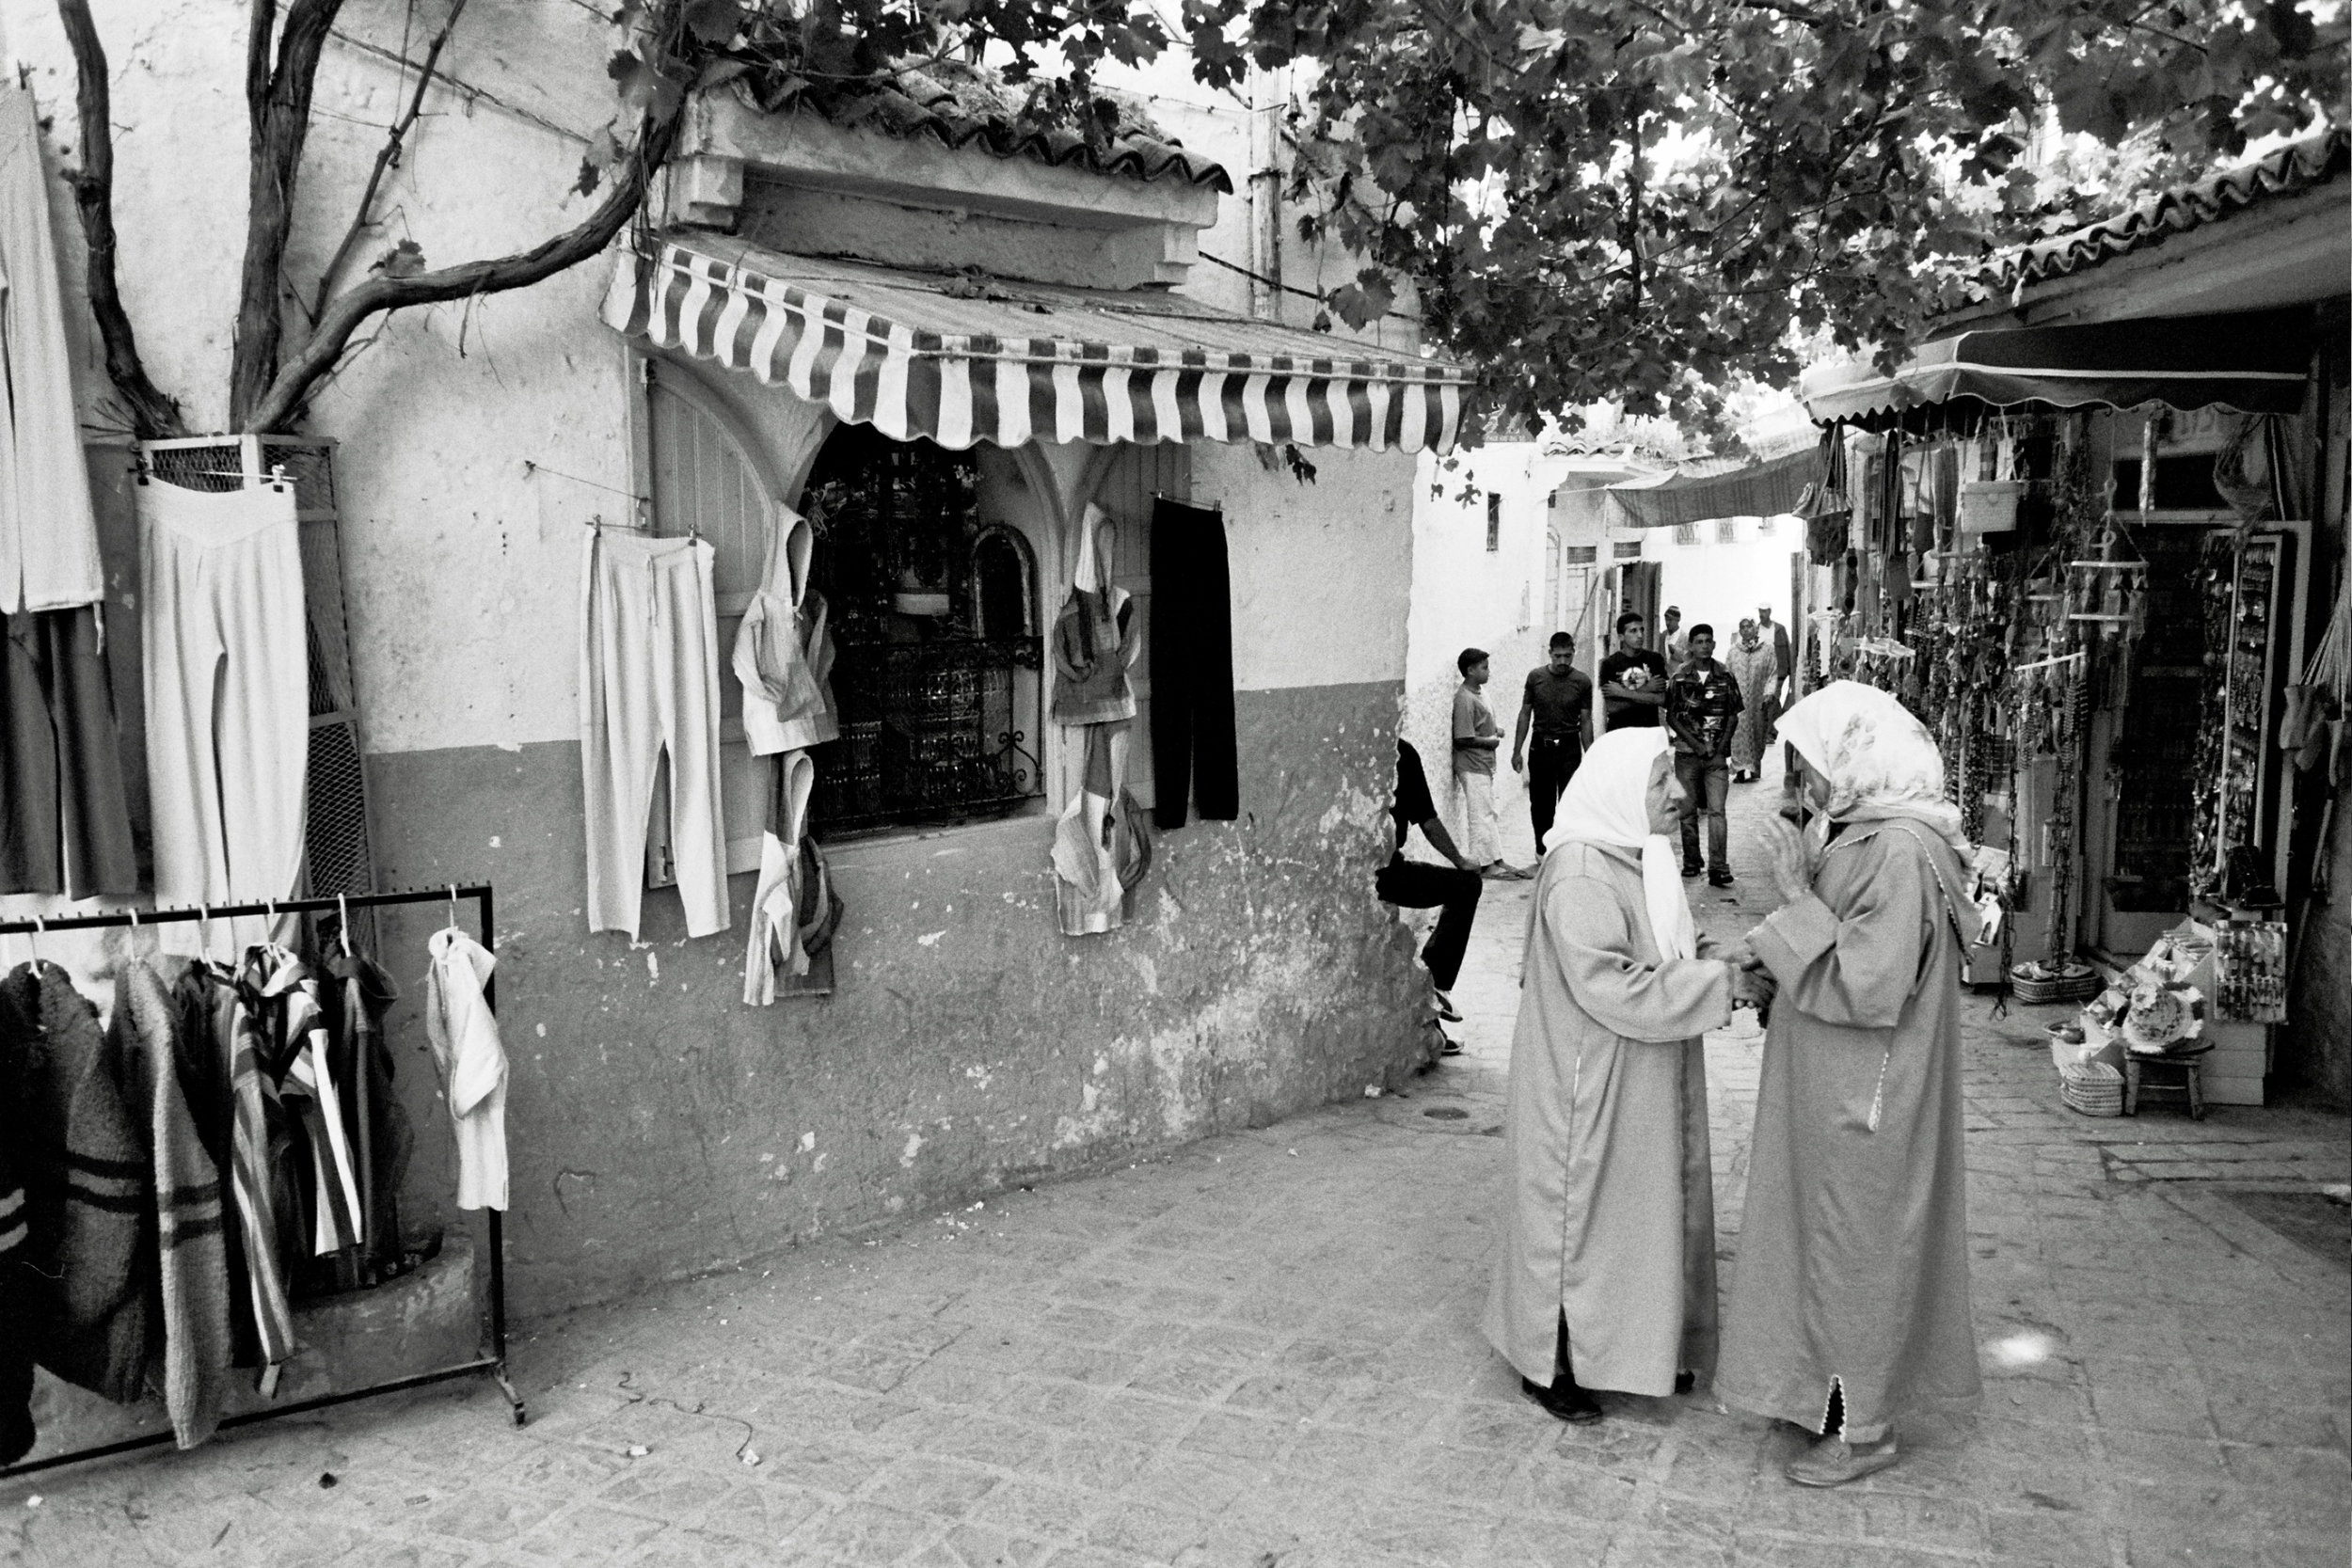 Chefchaouen, Morocco, 2007